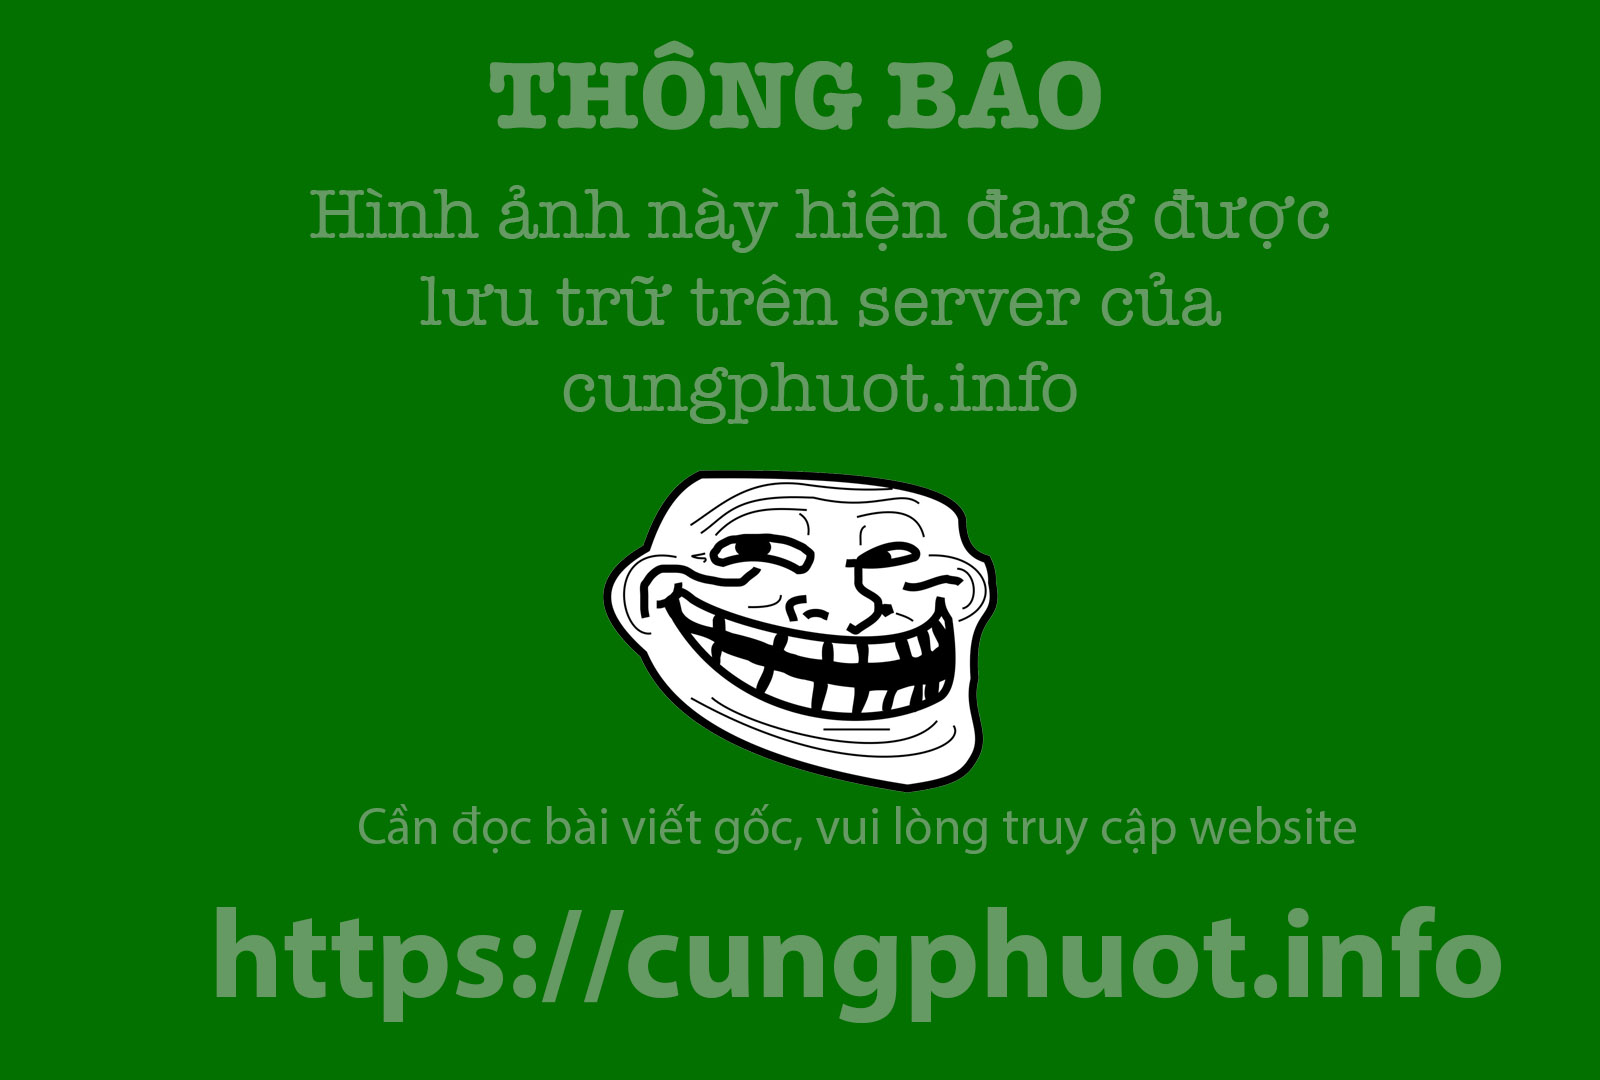 Den Moc Chau san mai anh dao hinh anh 1